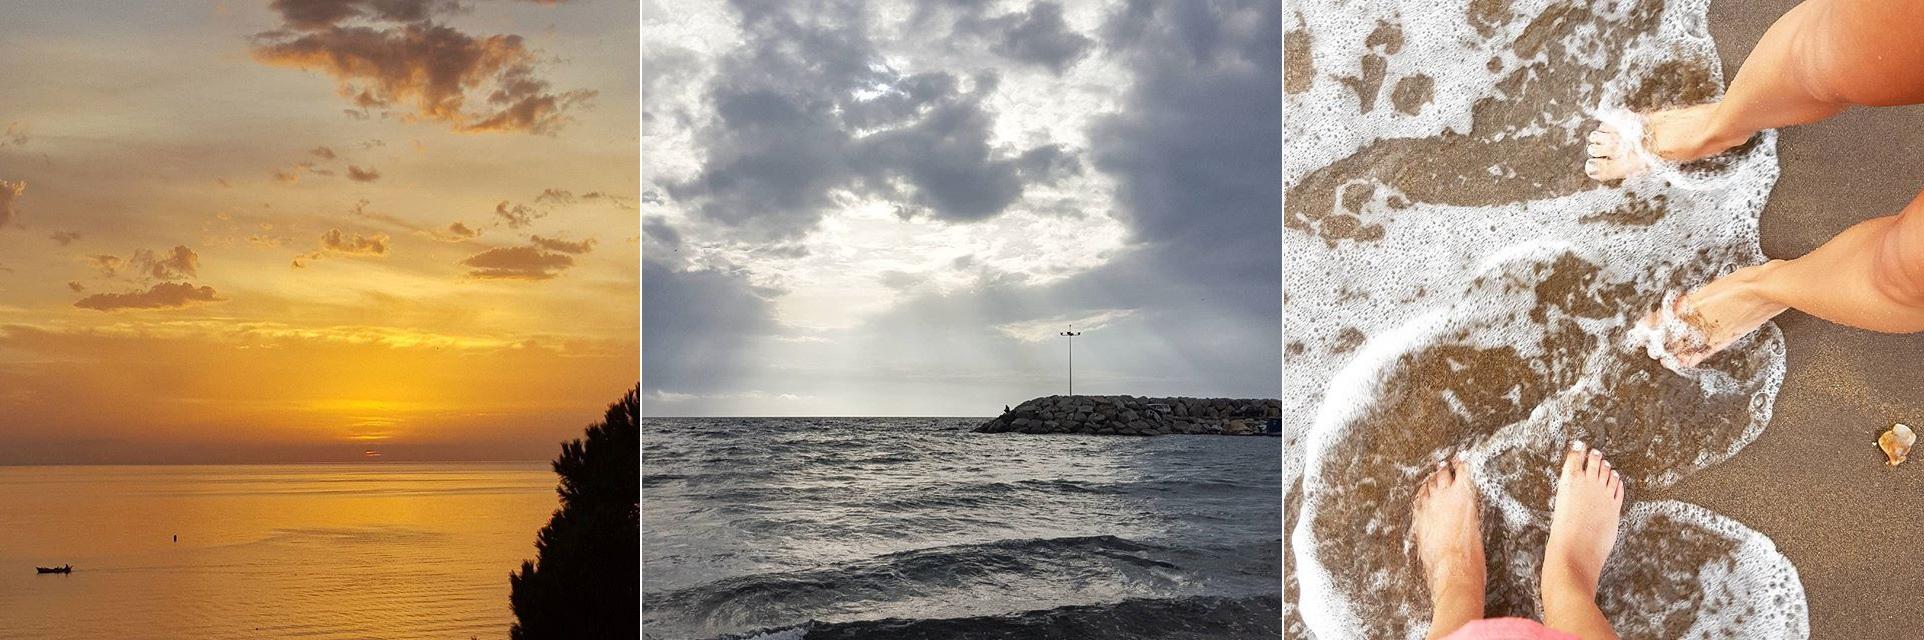 Türkei-Urlaub via Instagram 2